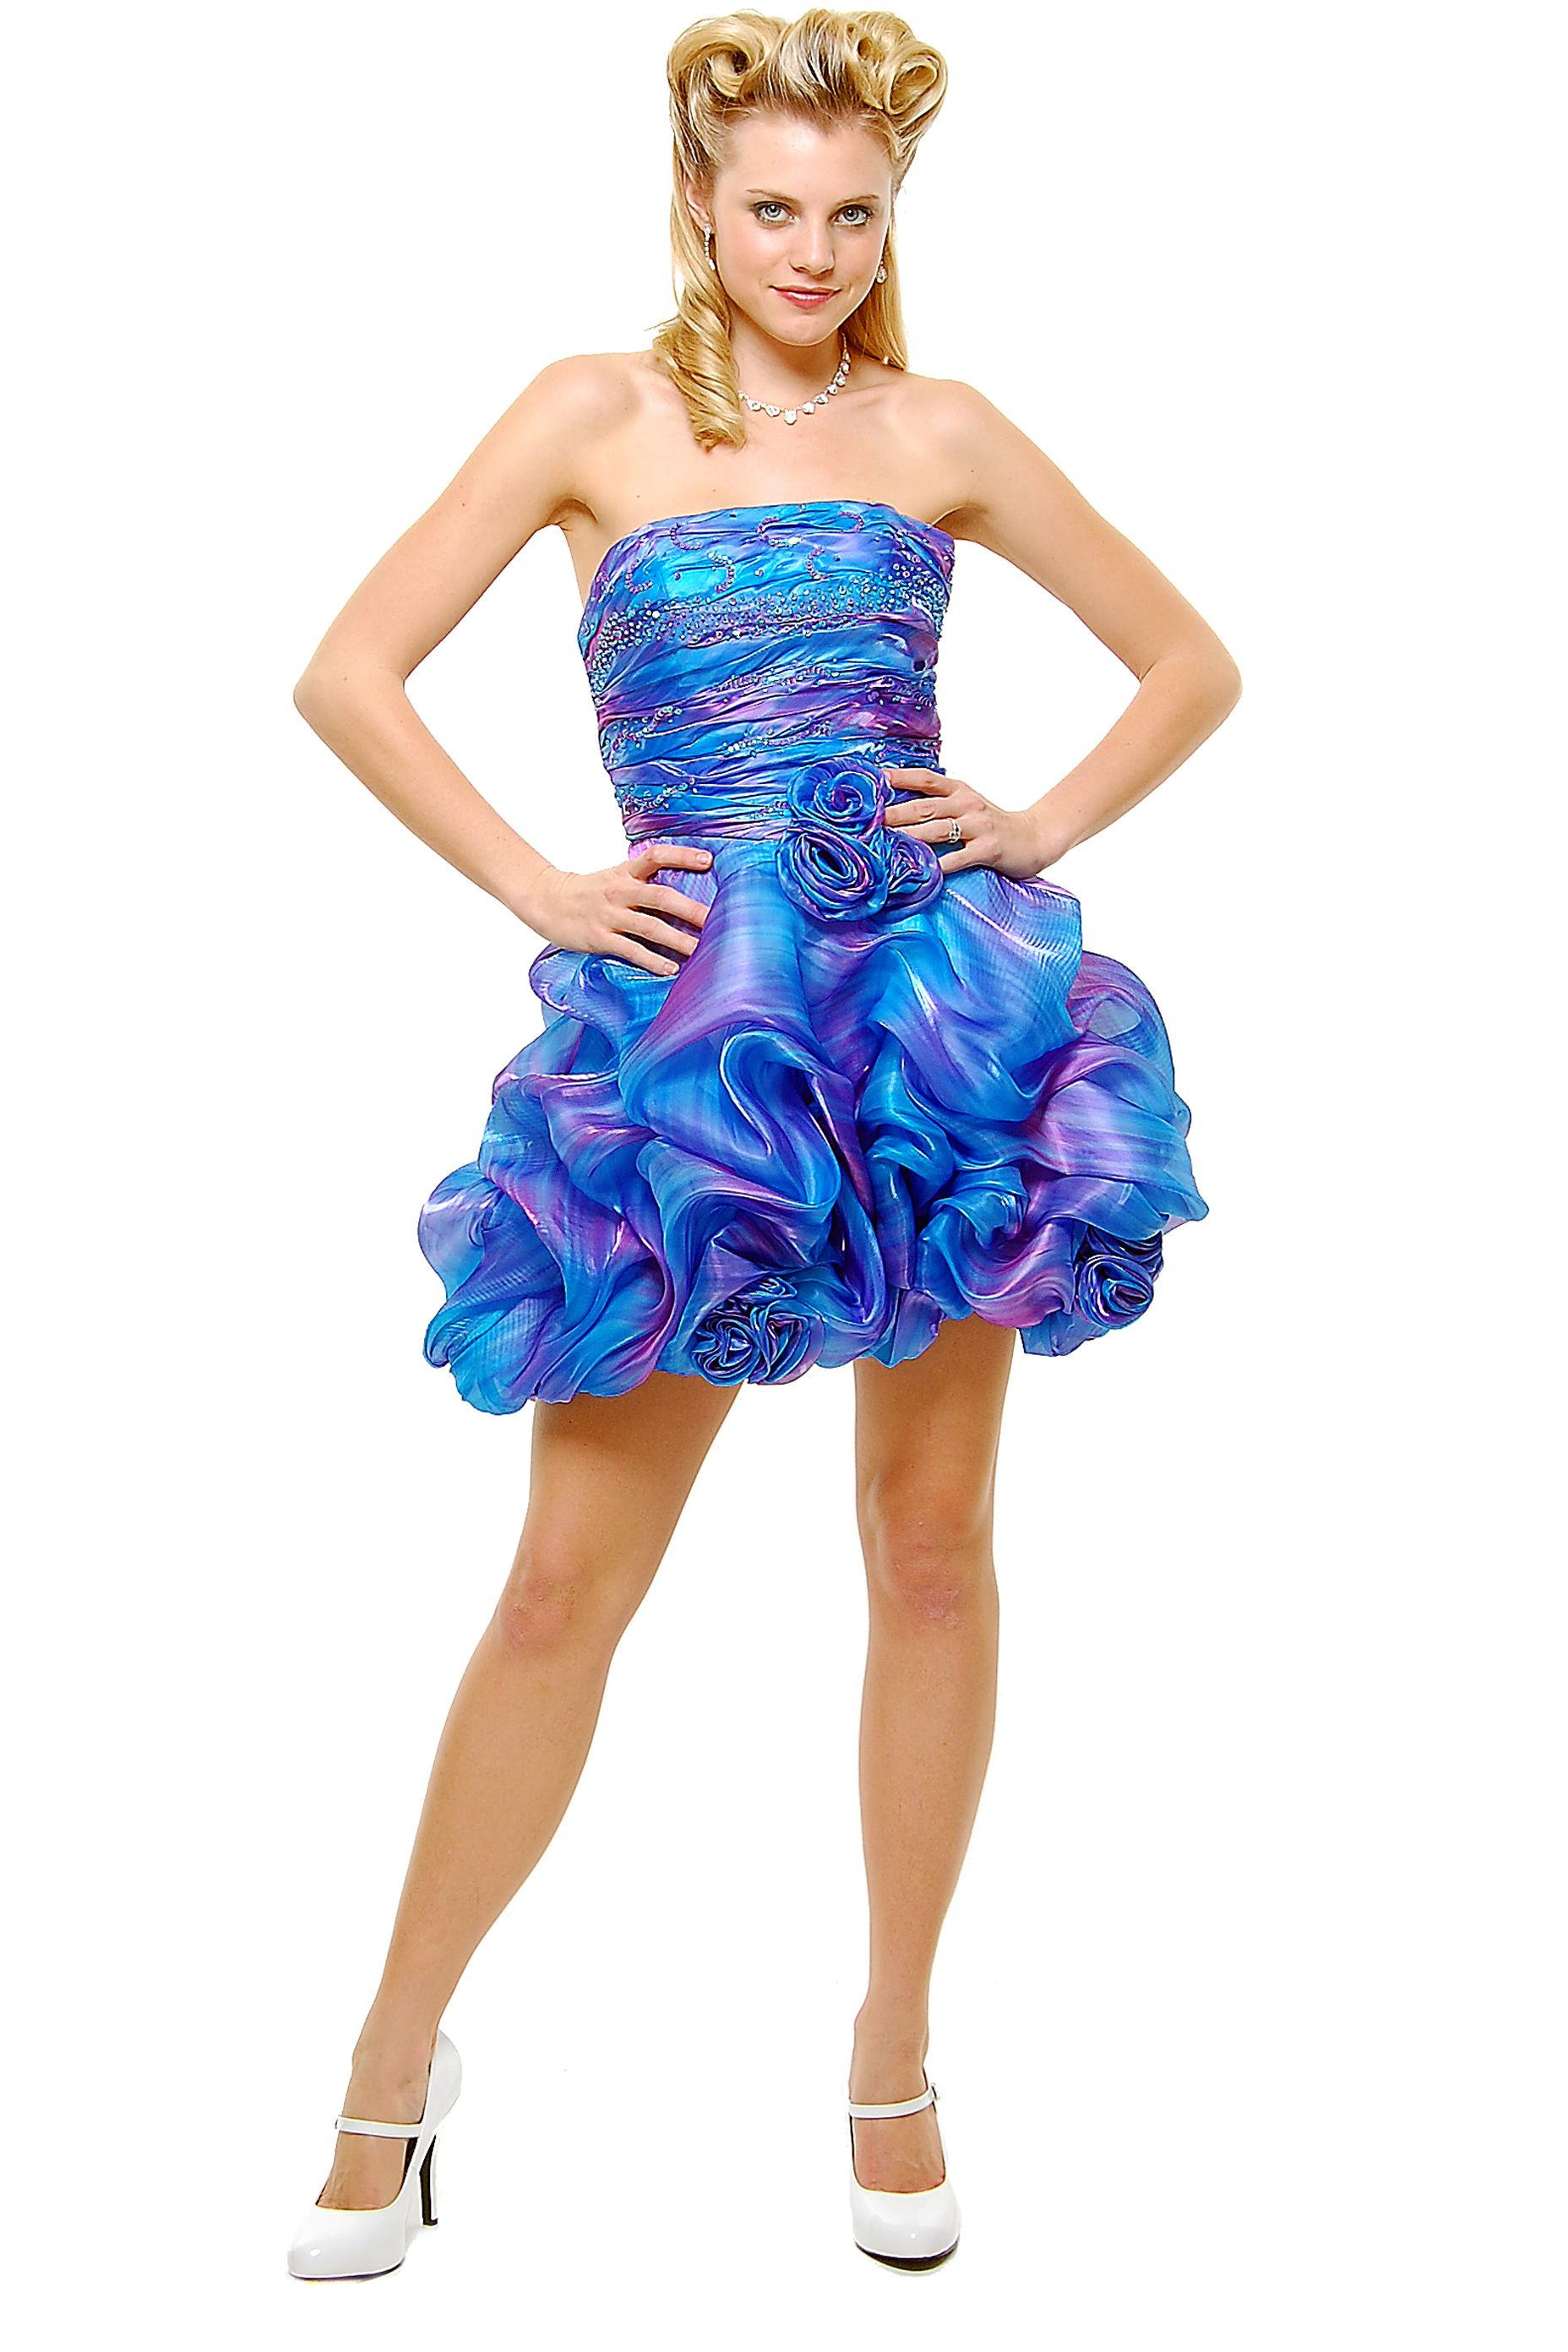 75feb0dc2de Affordable Homecoming Dresses - Gomes Weine AG